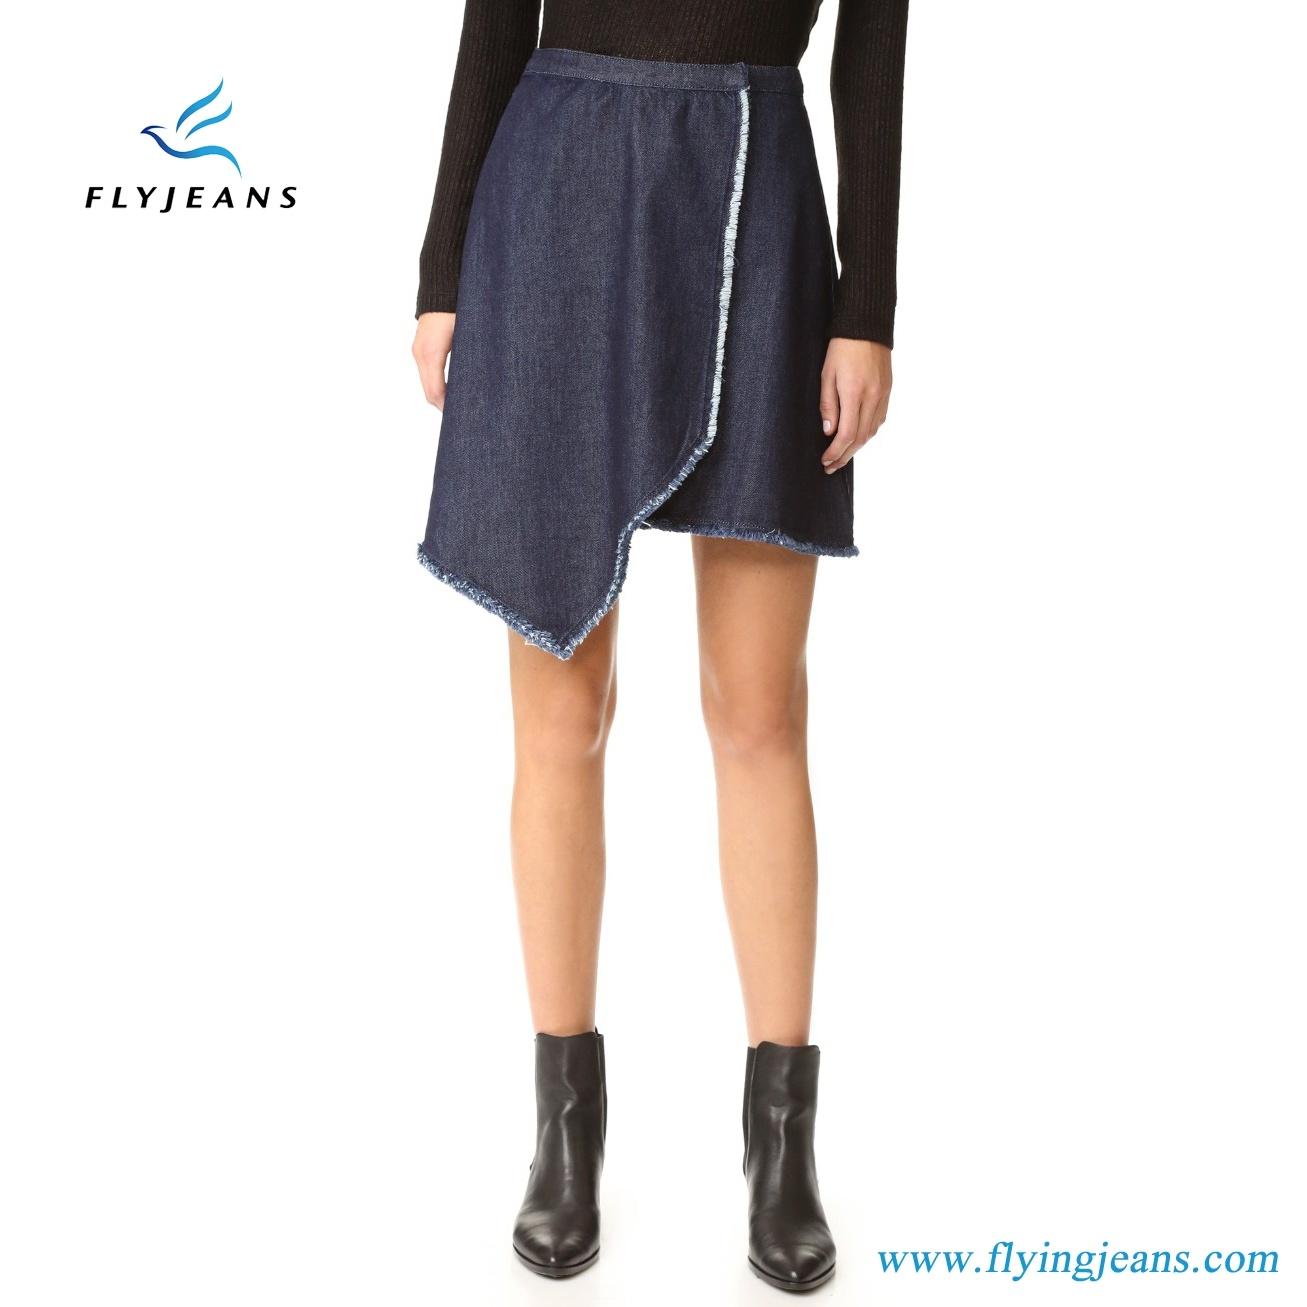 Fashion Ladies/Girls Denim Mini Skirts with Draped Asymmetrical Design Frayed Edges (Jeans E. P. 512)